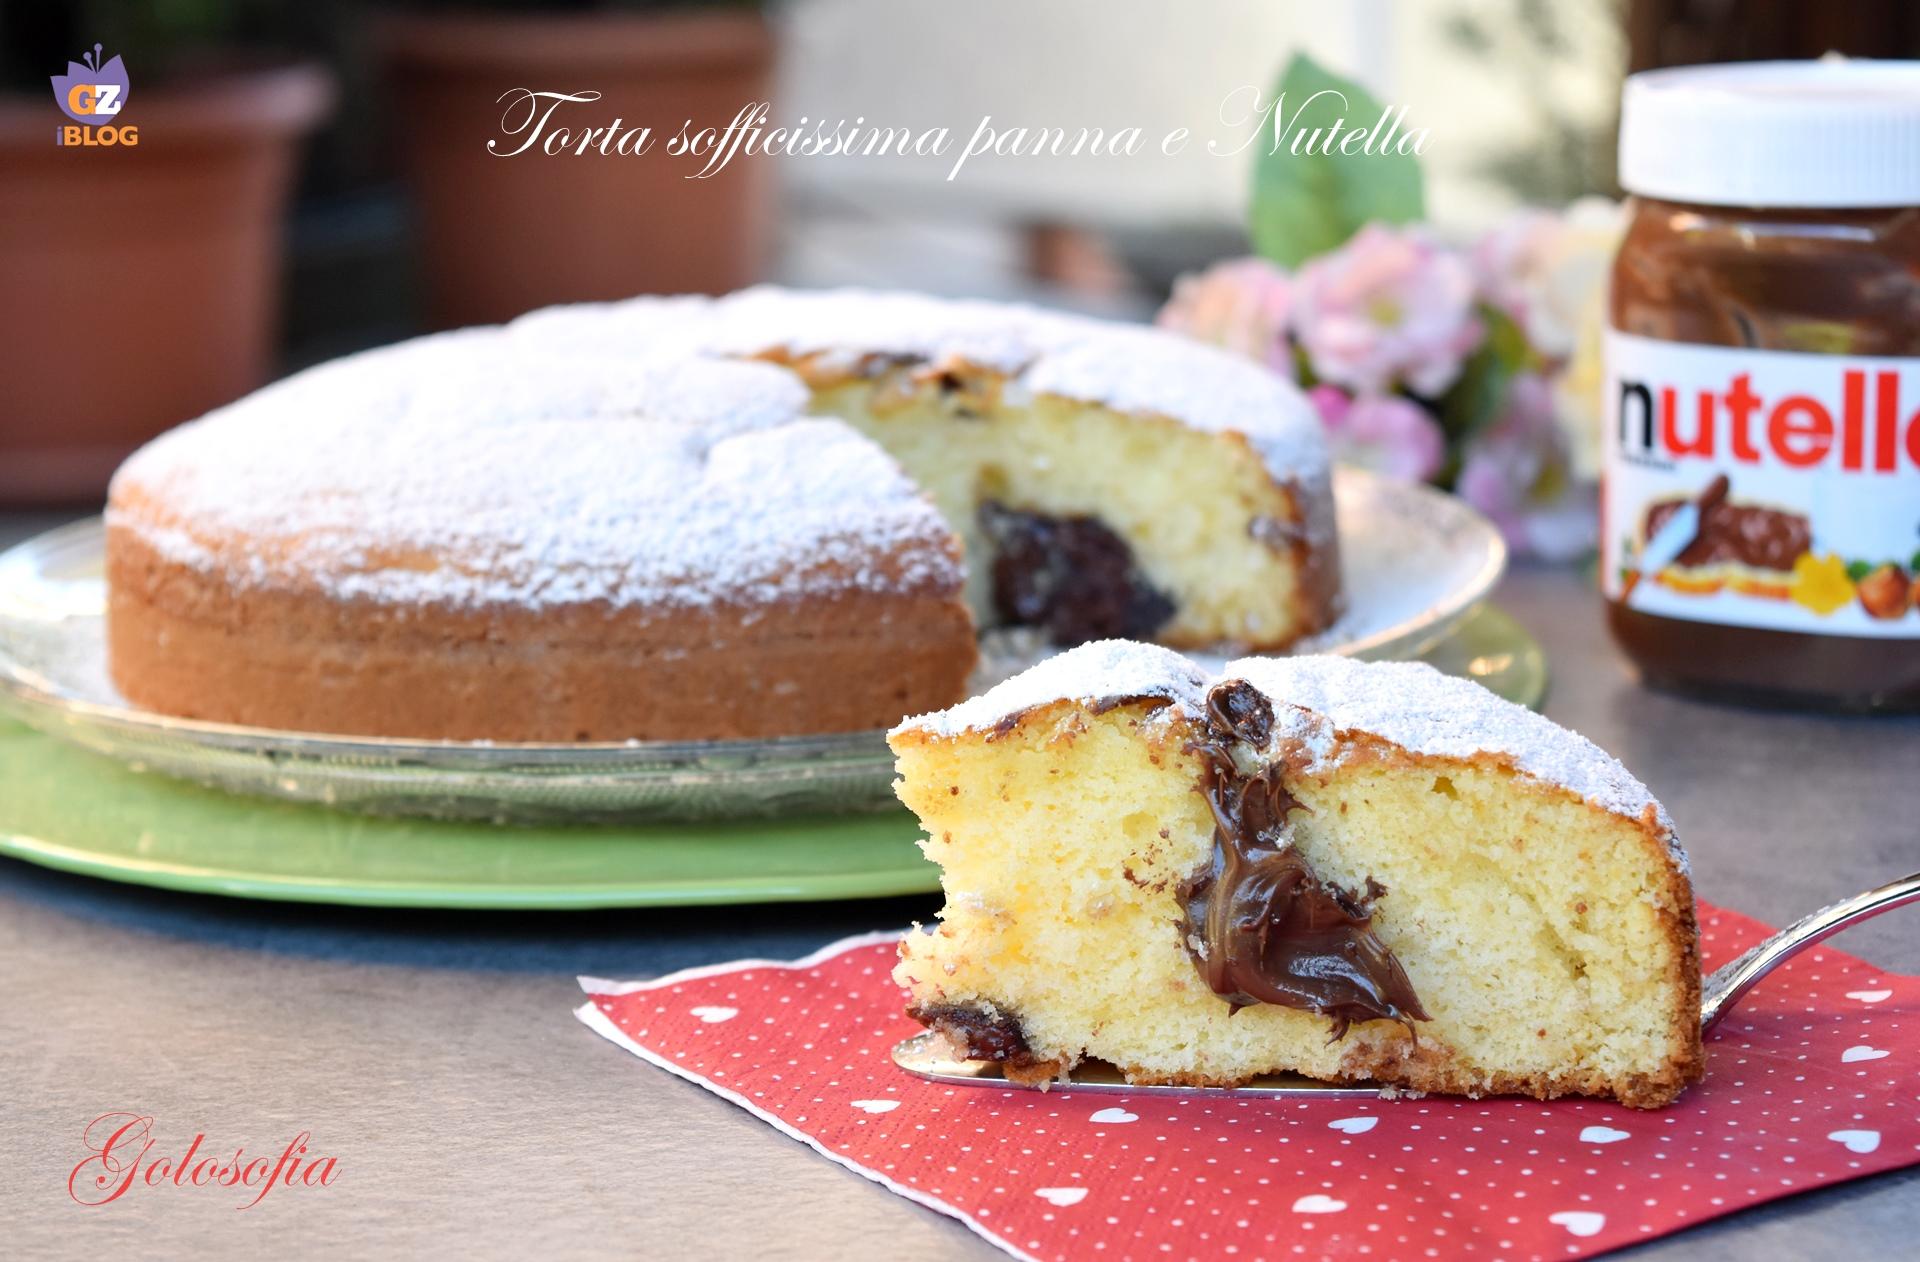 Torta sofficissima panna e nutella-ricetta torte-golosofia